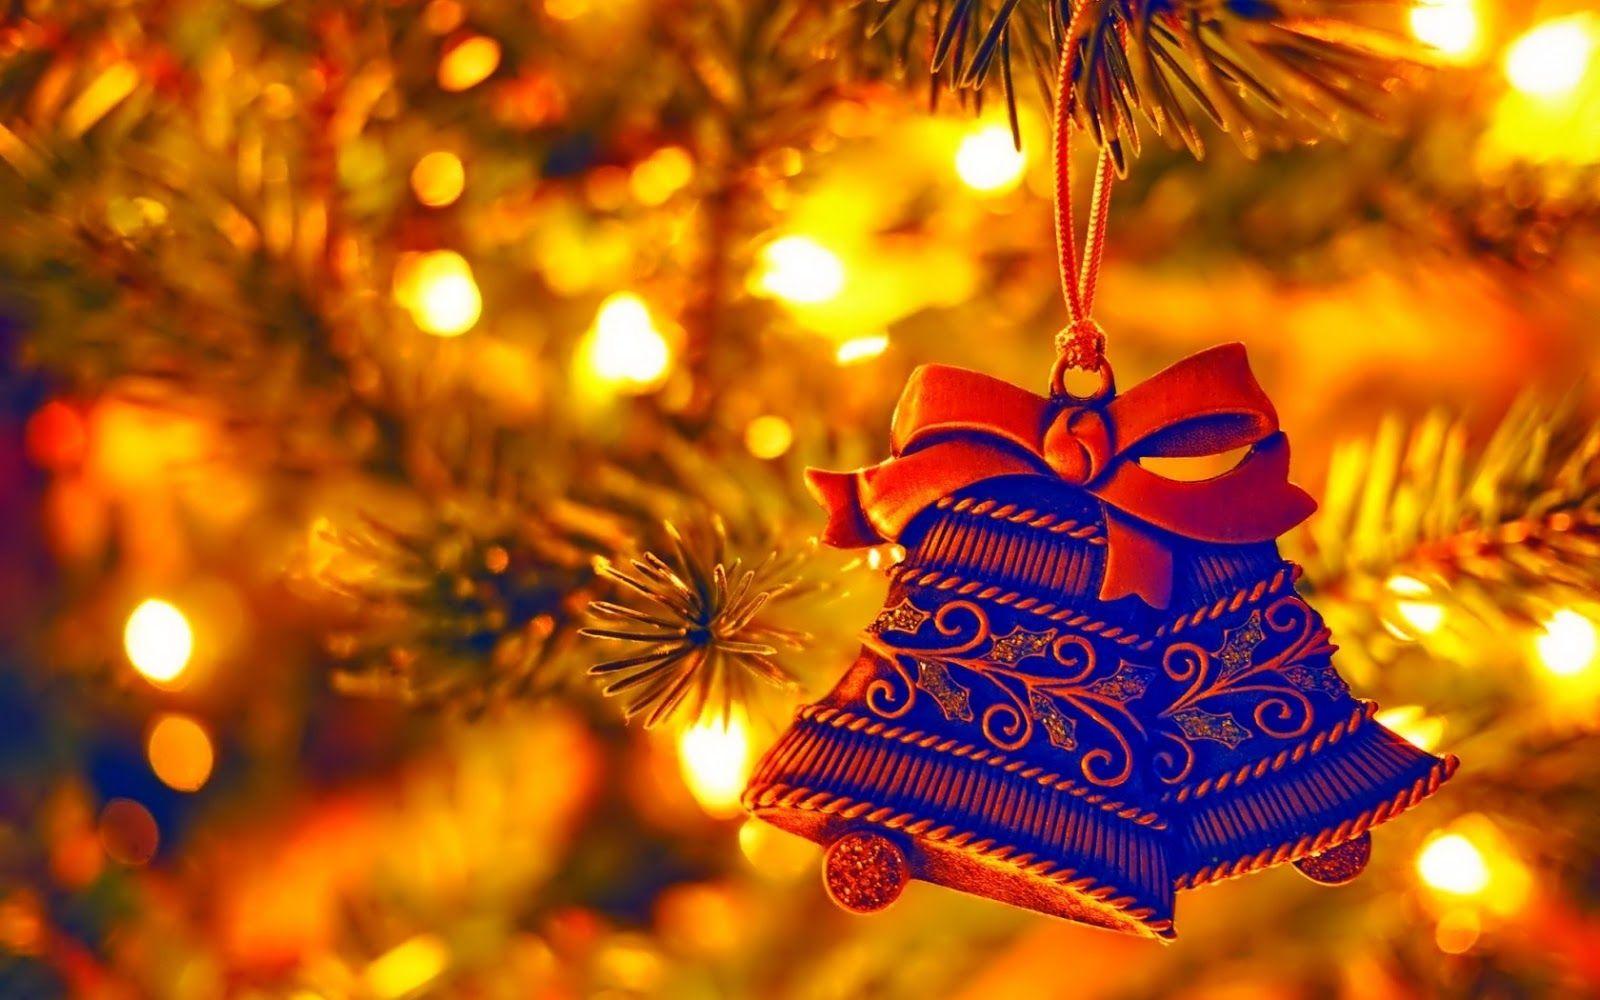 Christmas Bells Hd Wallpapers Christmas Wallpaper Hd Decorating With Christmas Lights Christmas Tree Ornaments Wallpaper